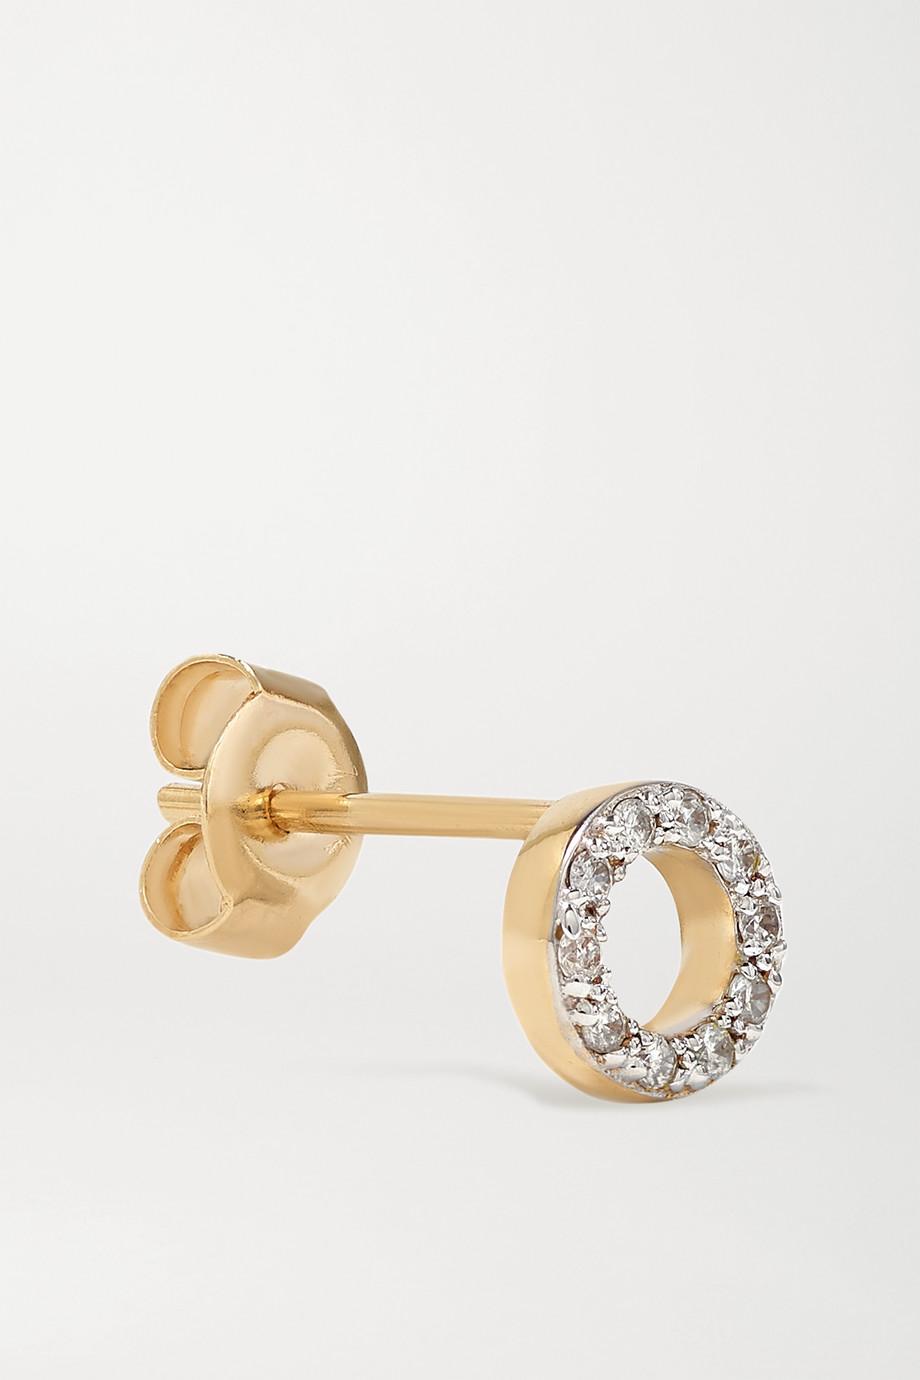 Mateo 14K 黄金钻石耳钉